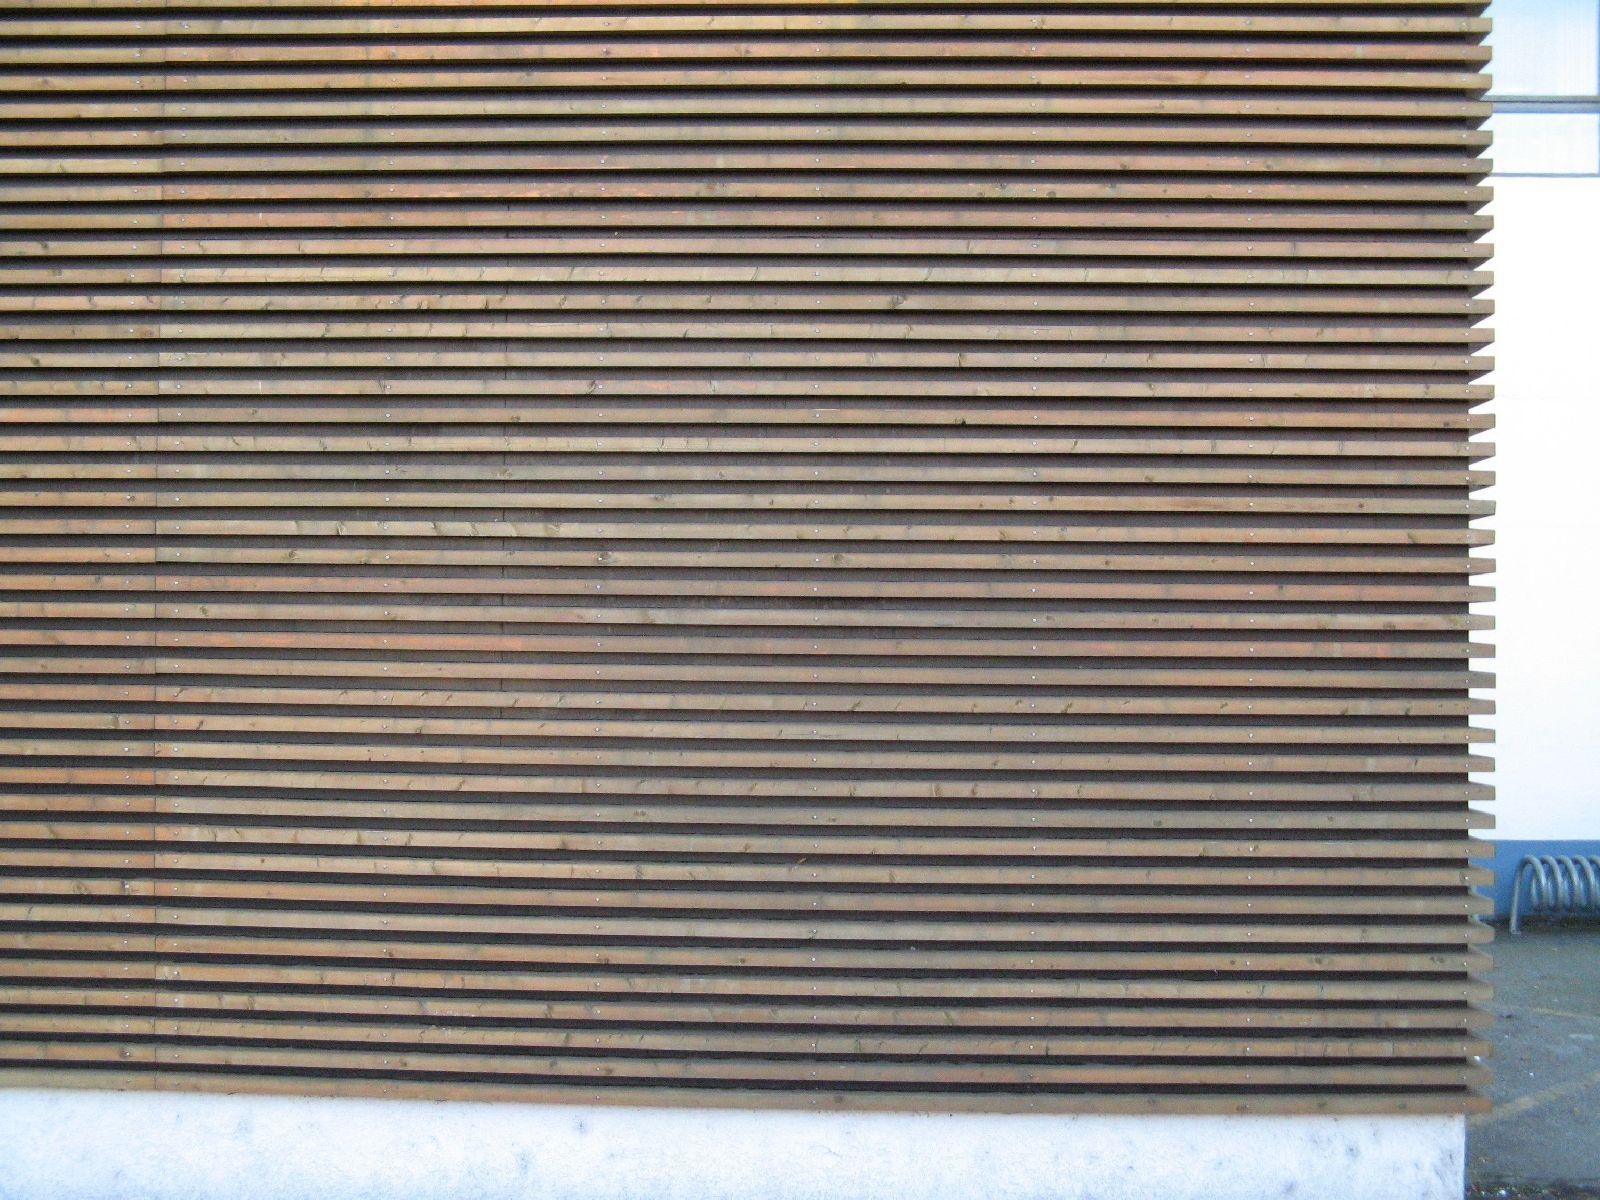 Wood_Textures_B_4994